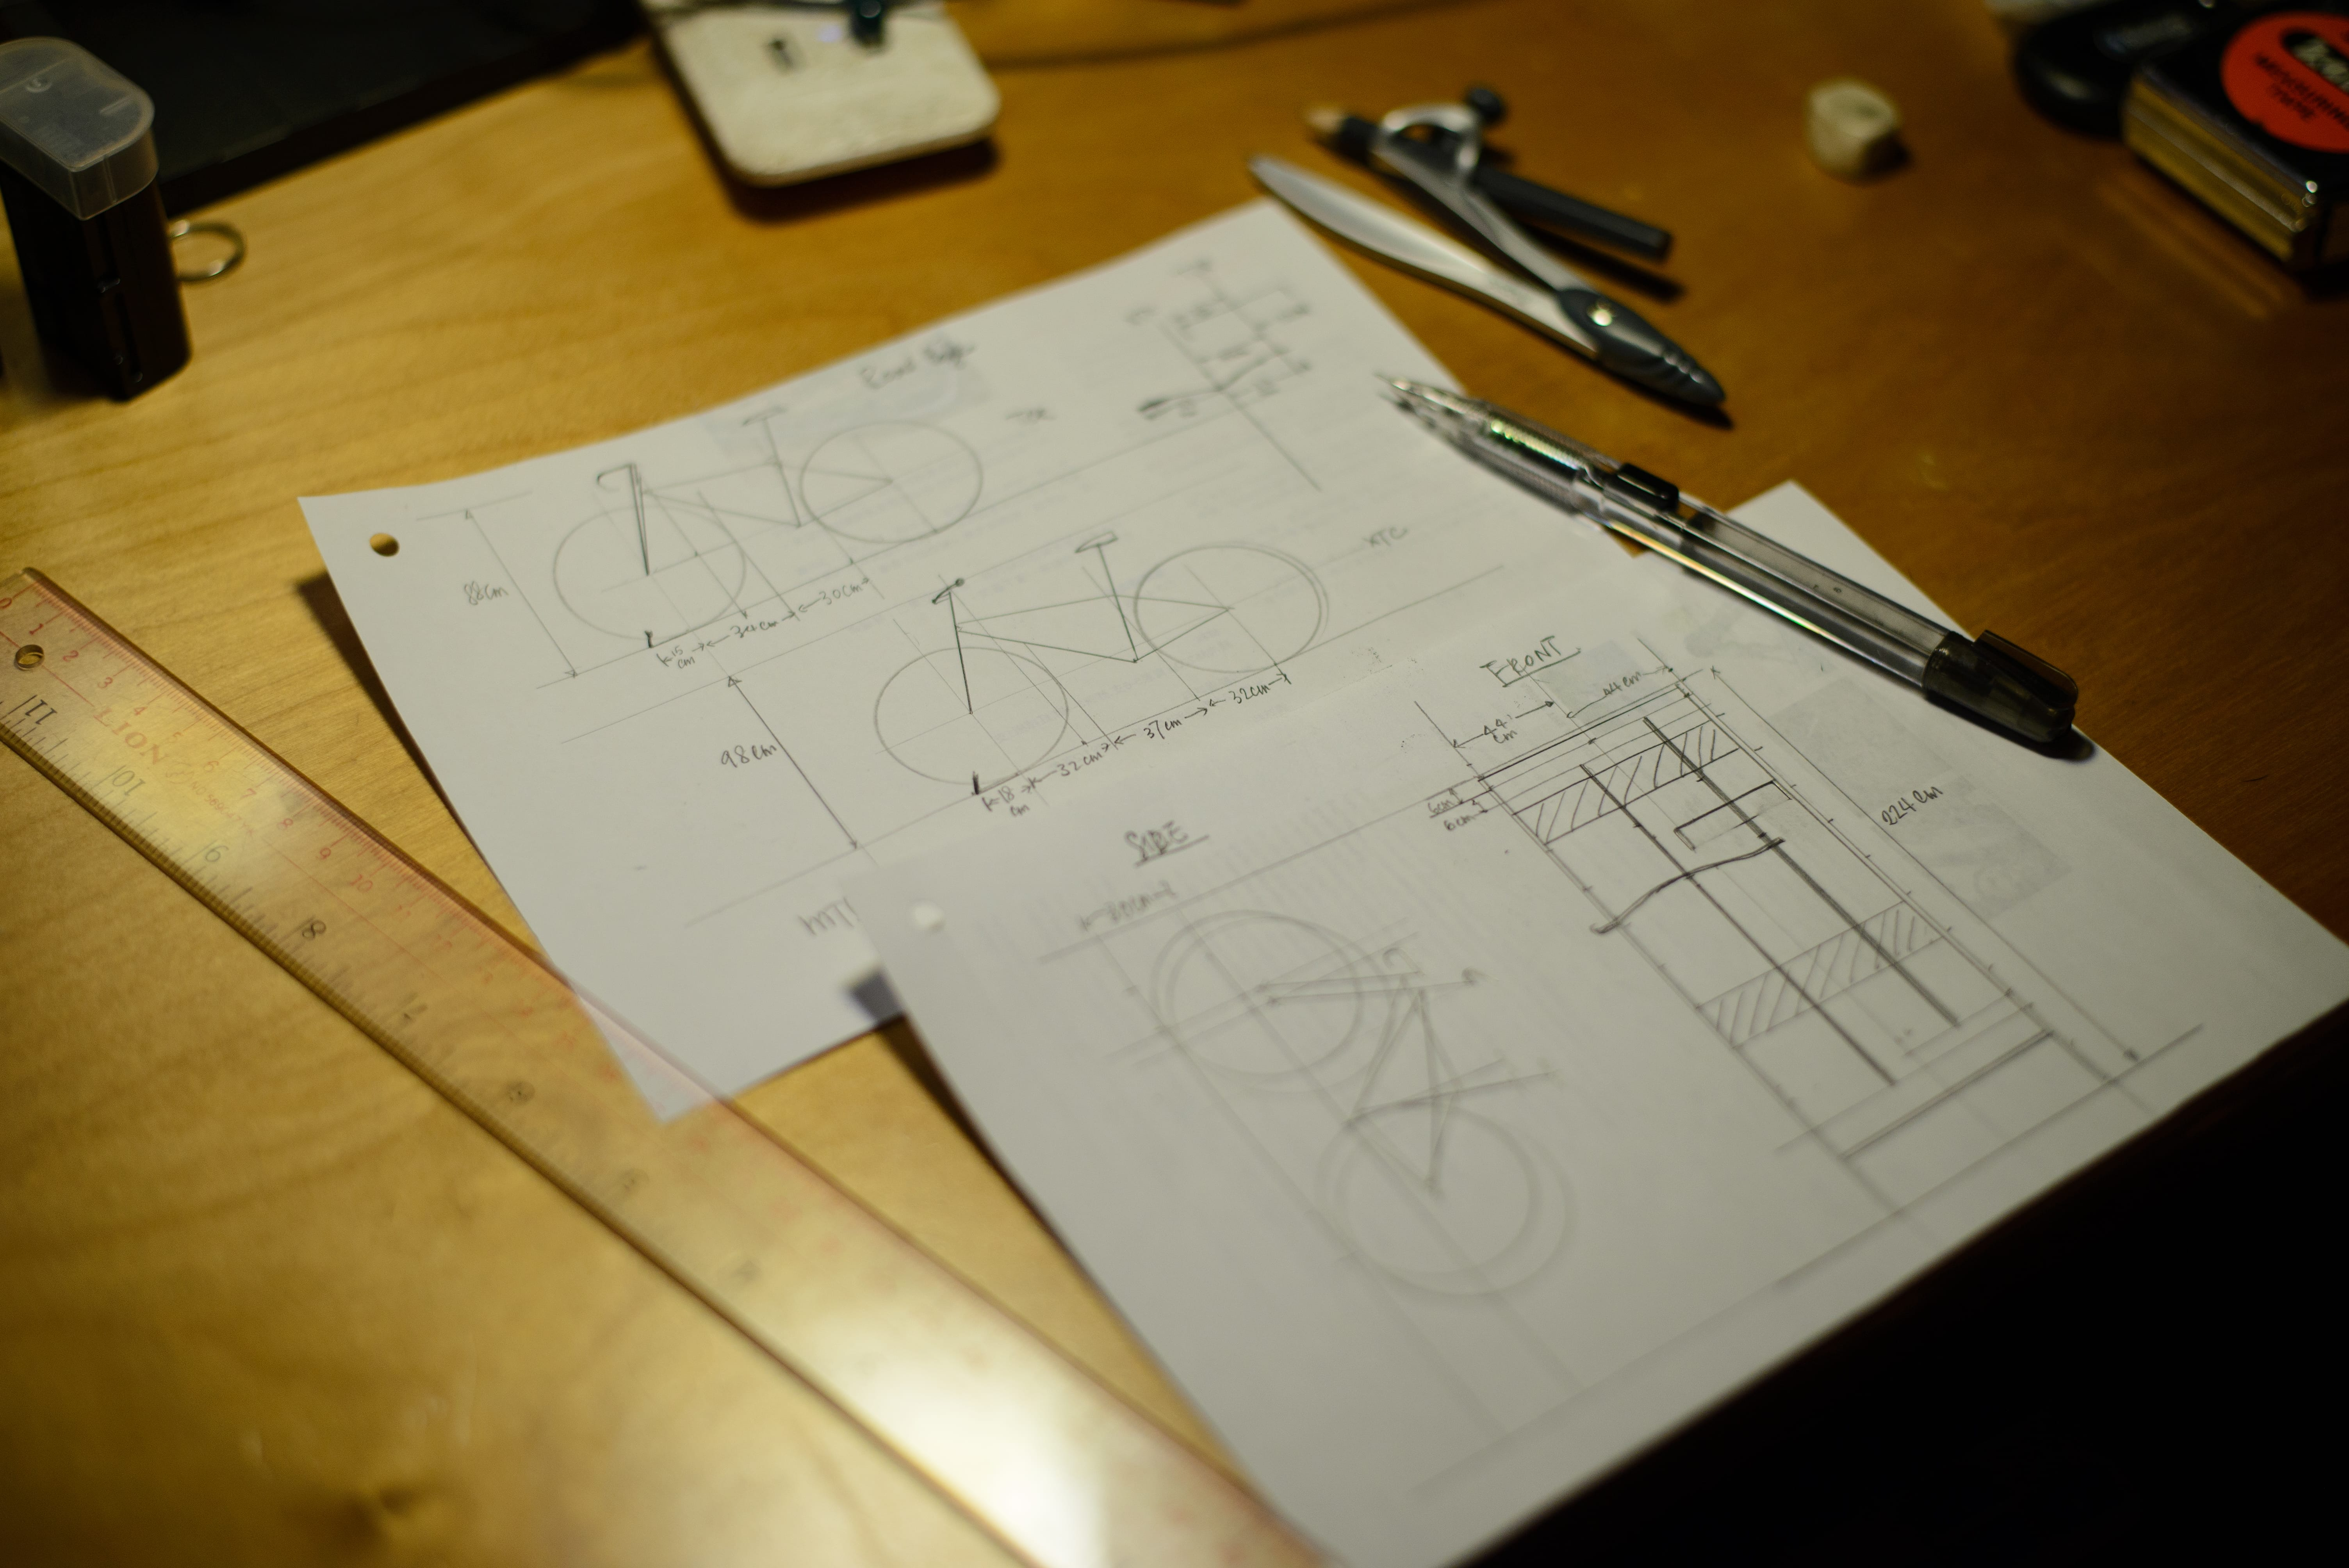 Draft design for the DIY Bike Rack